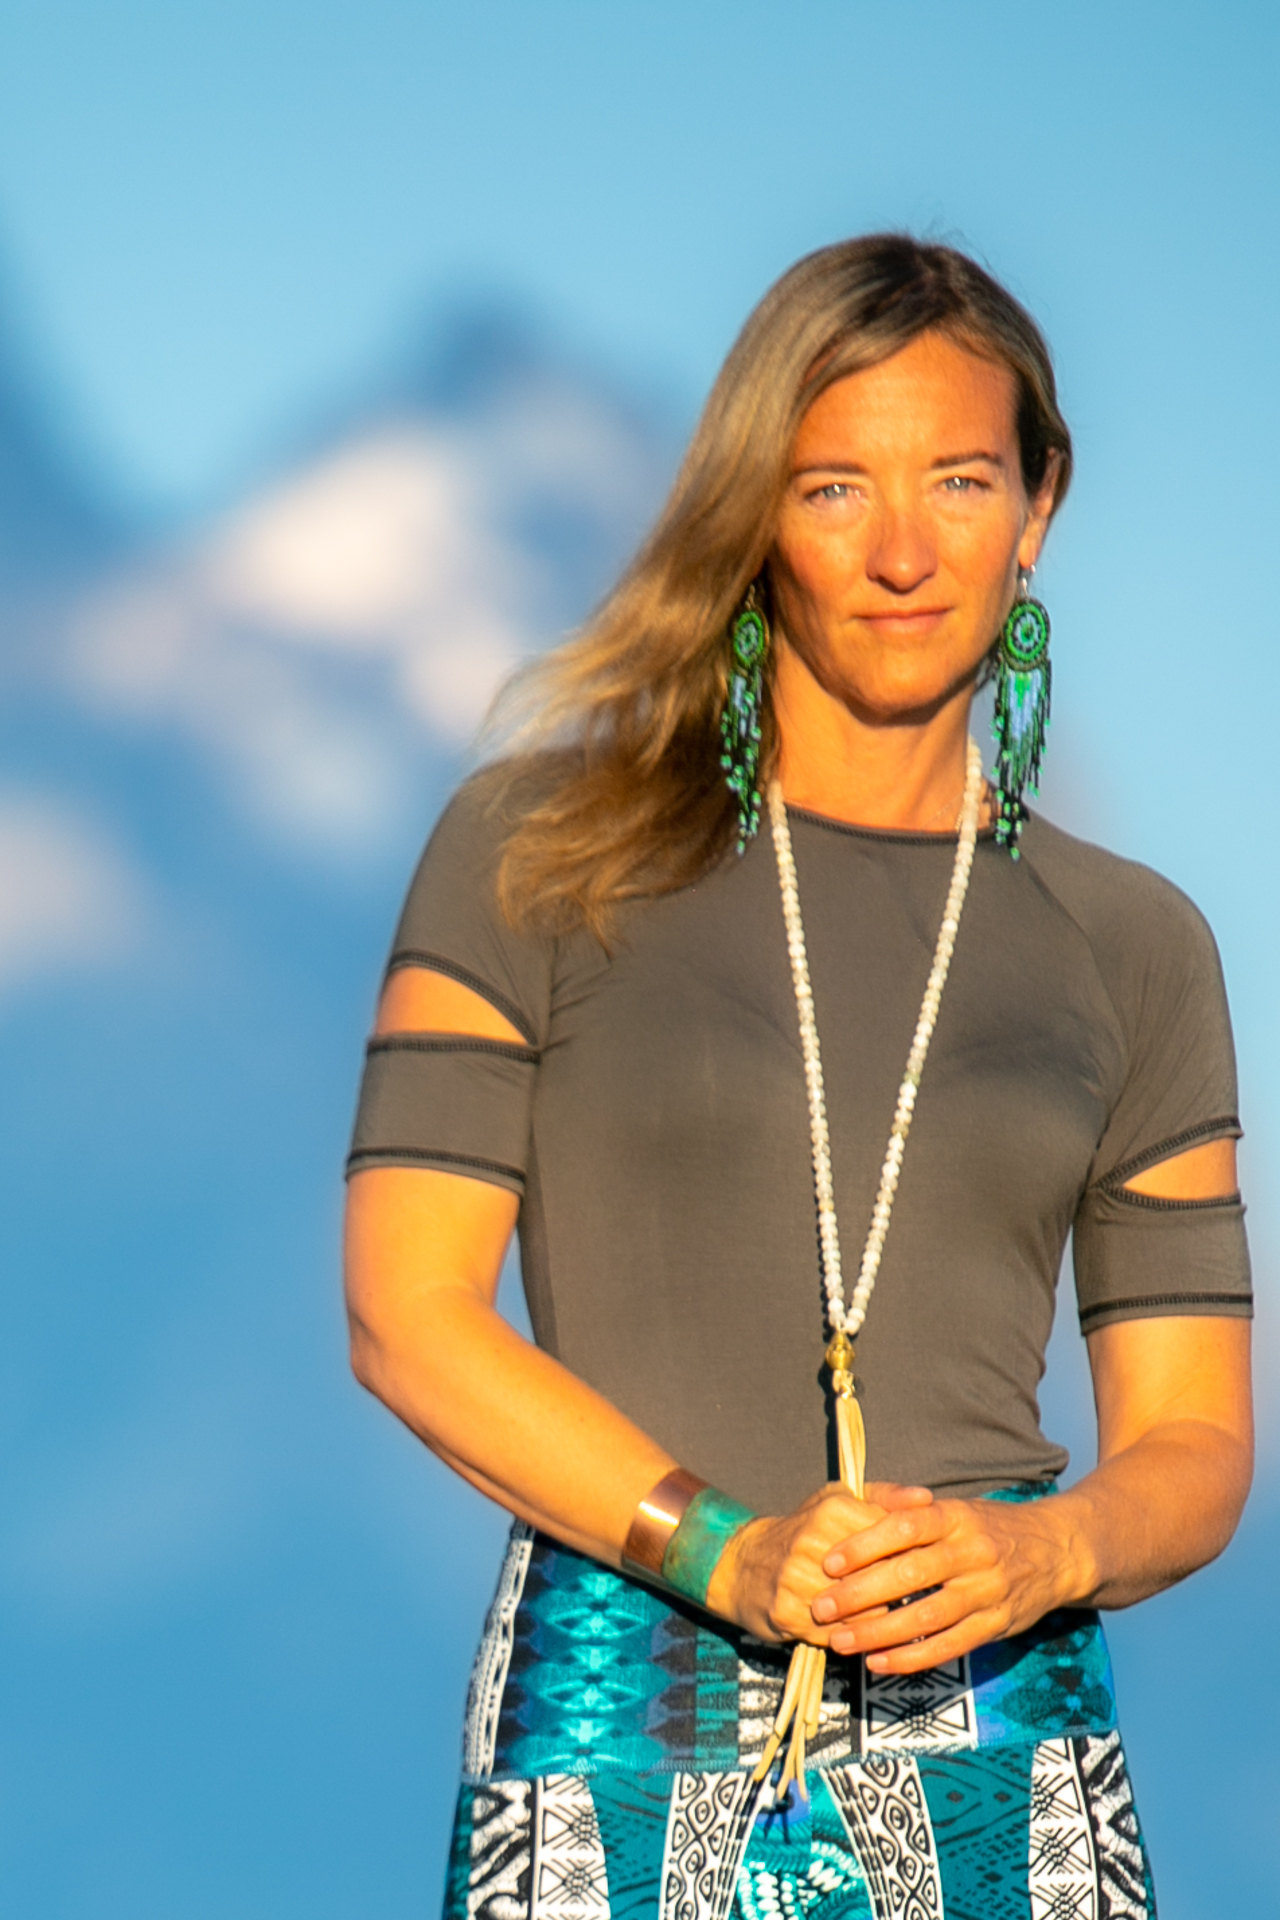 Fashion designer Autumn Teneyl wearing  short sleeved top in the Teton Mountains in Wyoming.